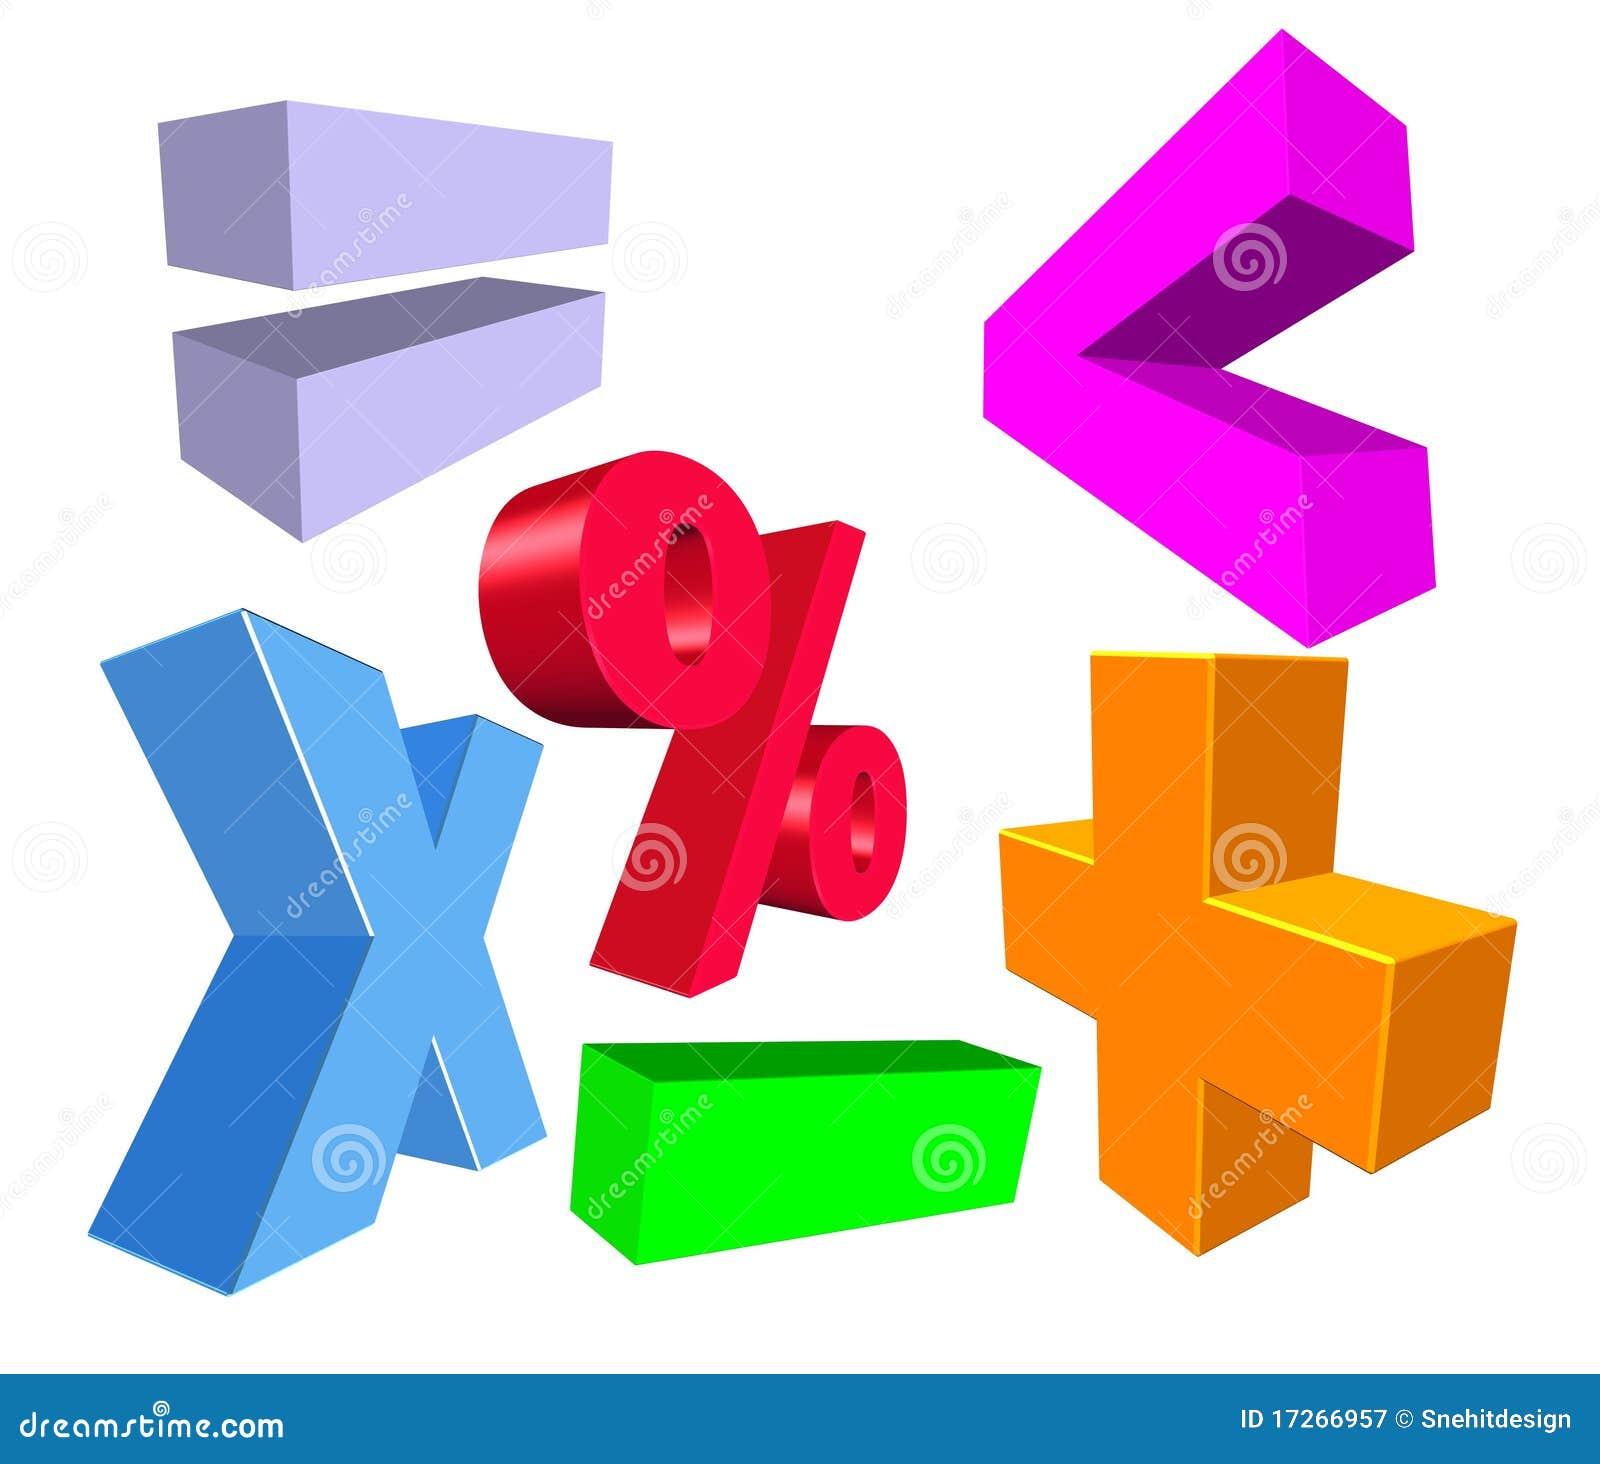 Clip Art Images Maths